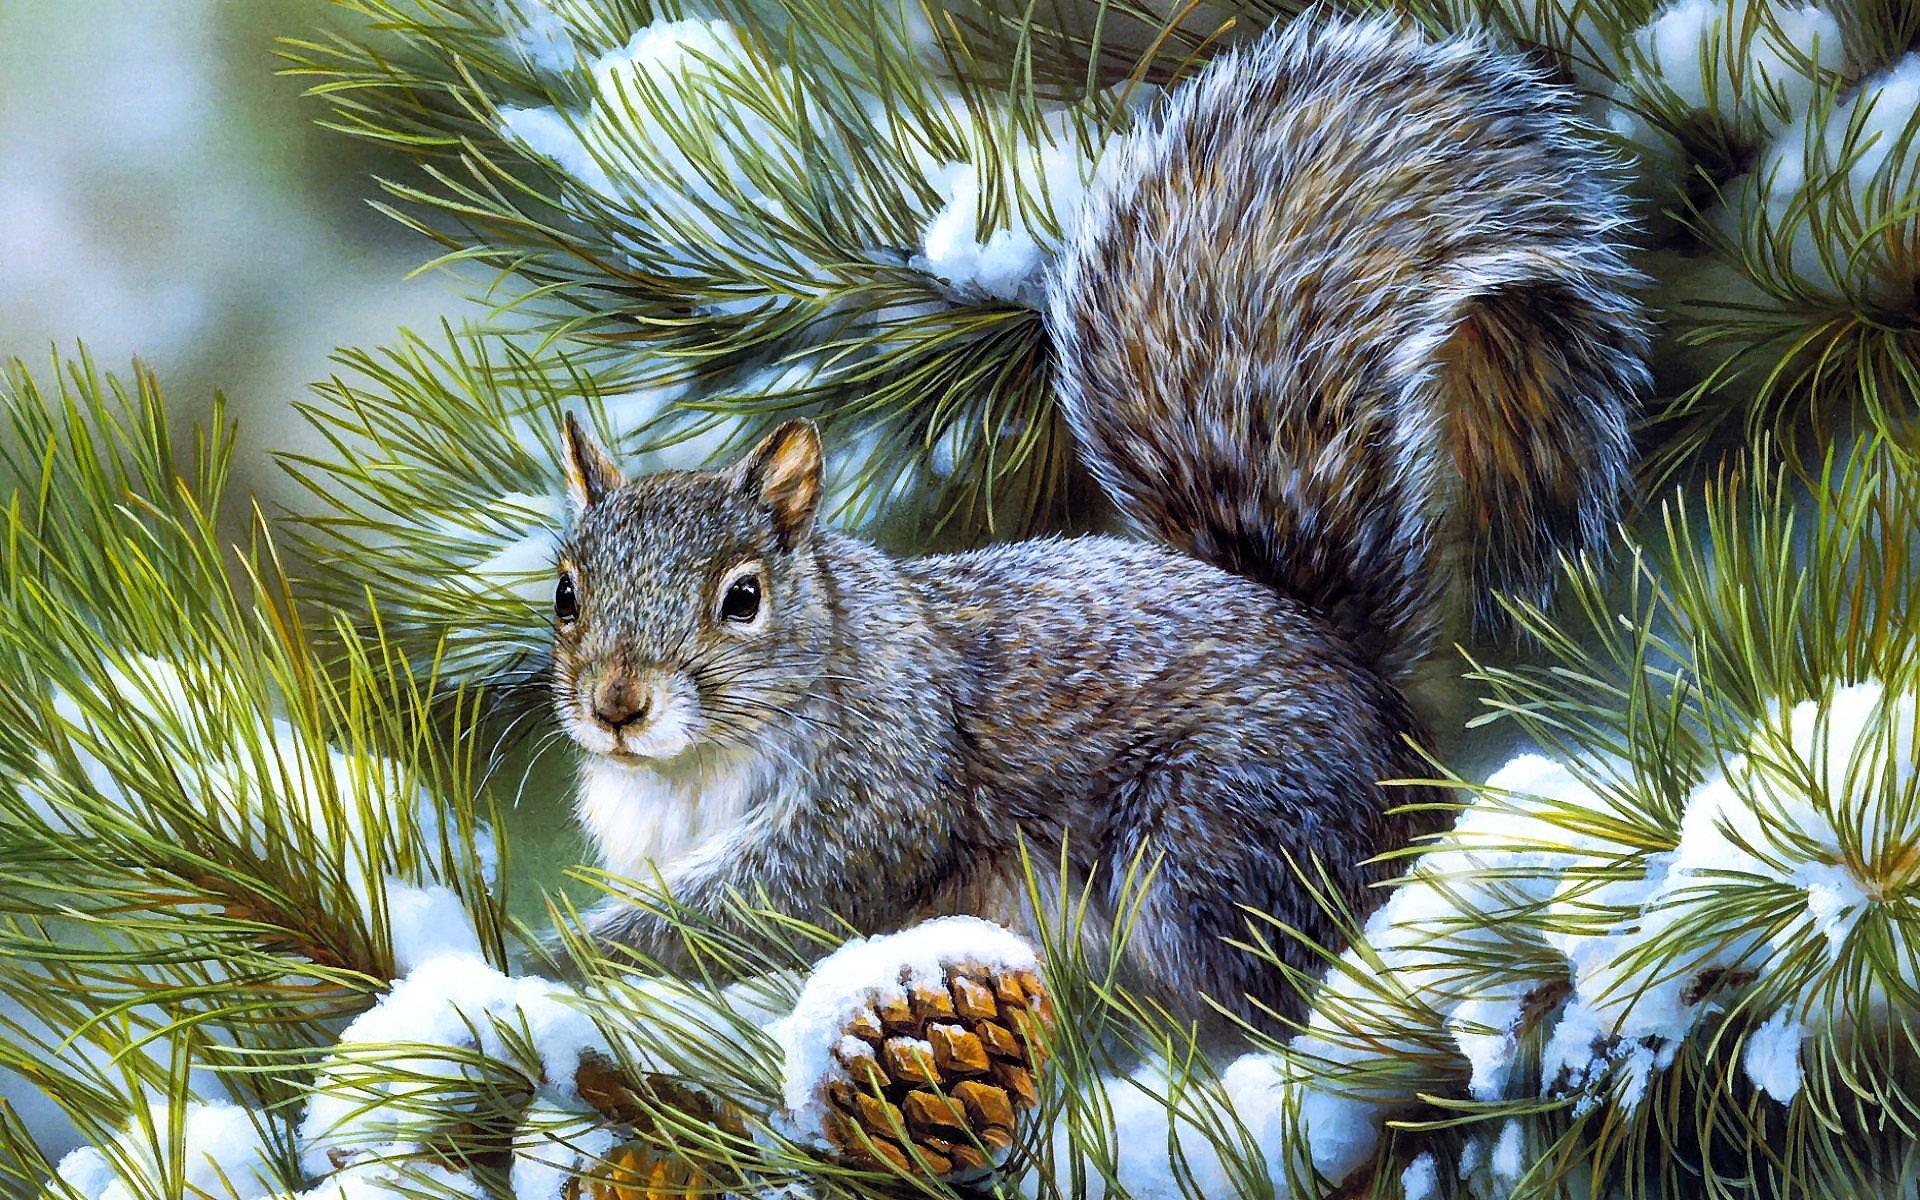 Squirrels animals rodents art artistic nature wildlife winter snow 1920x1200